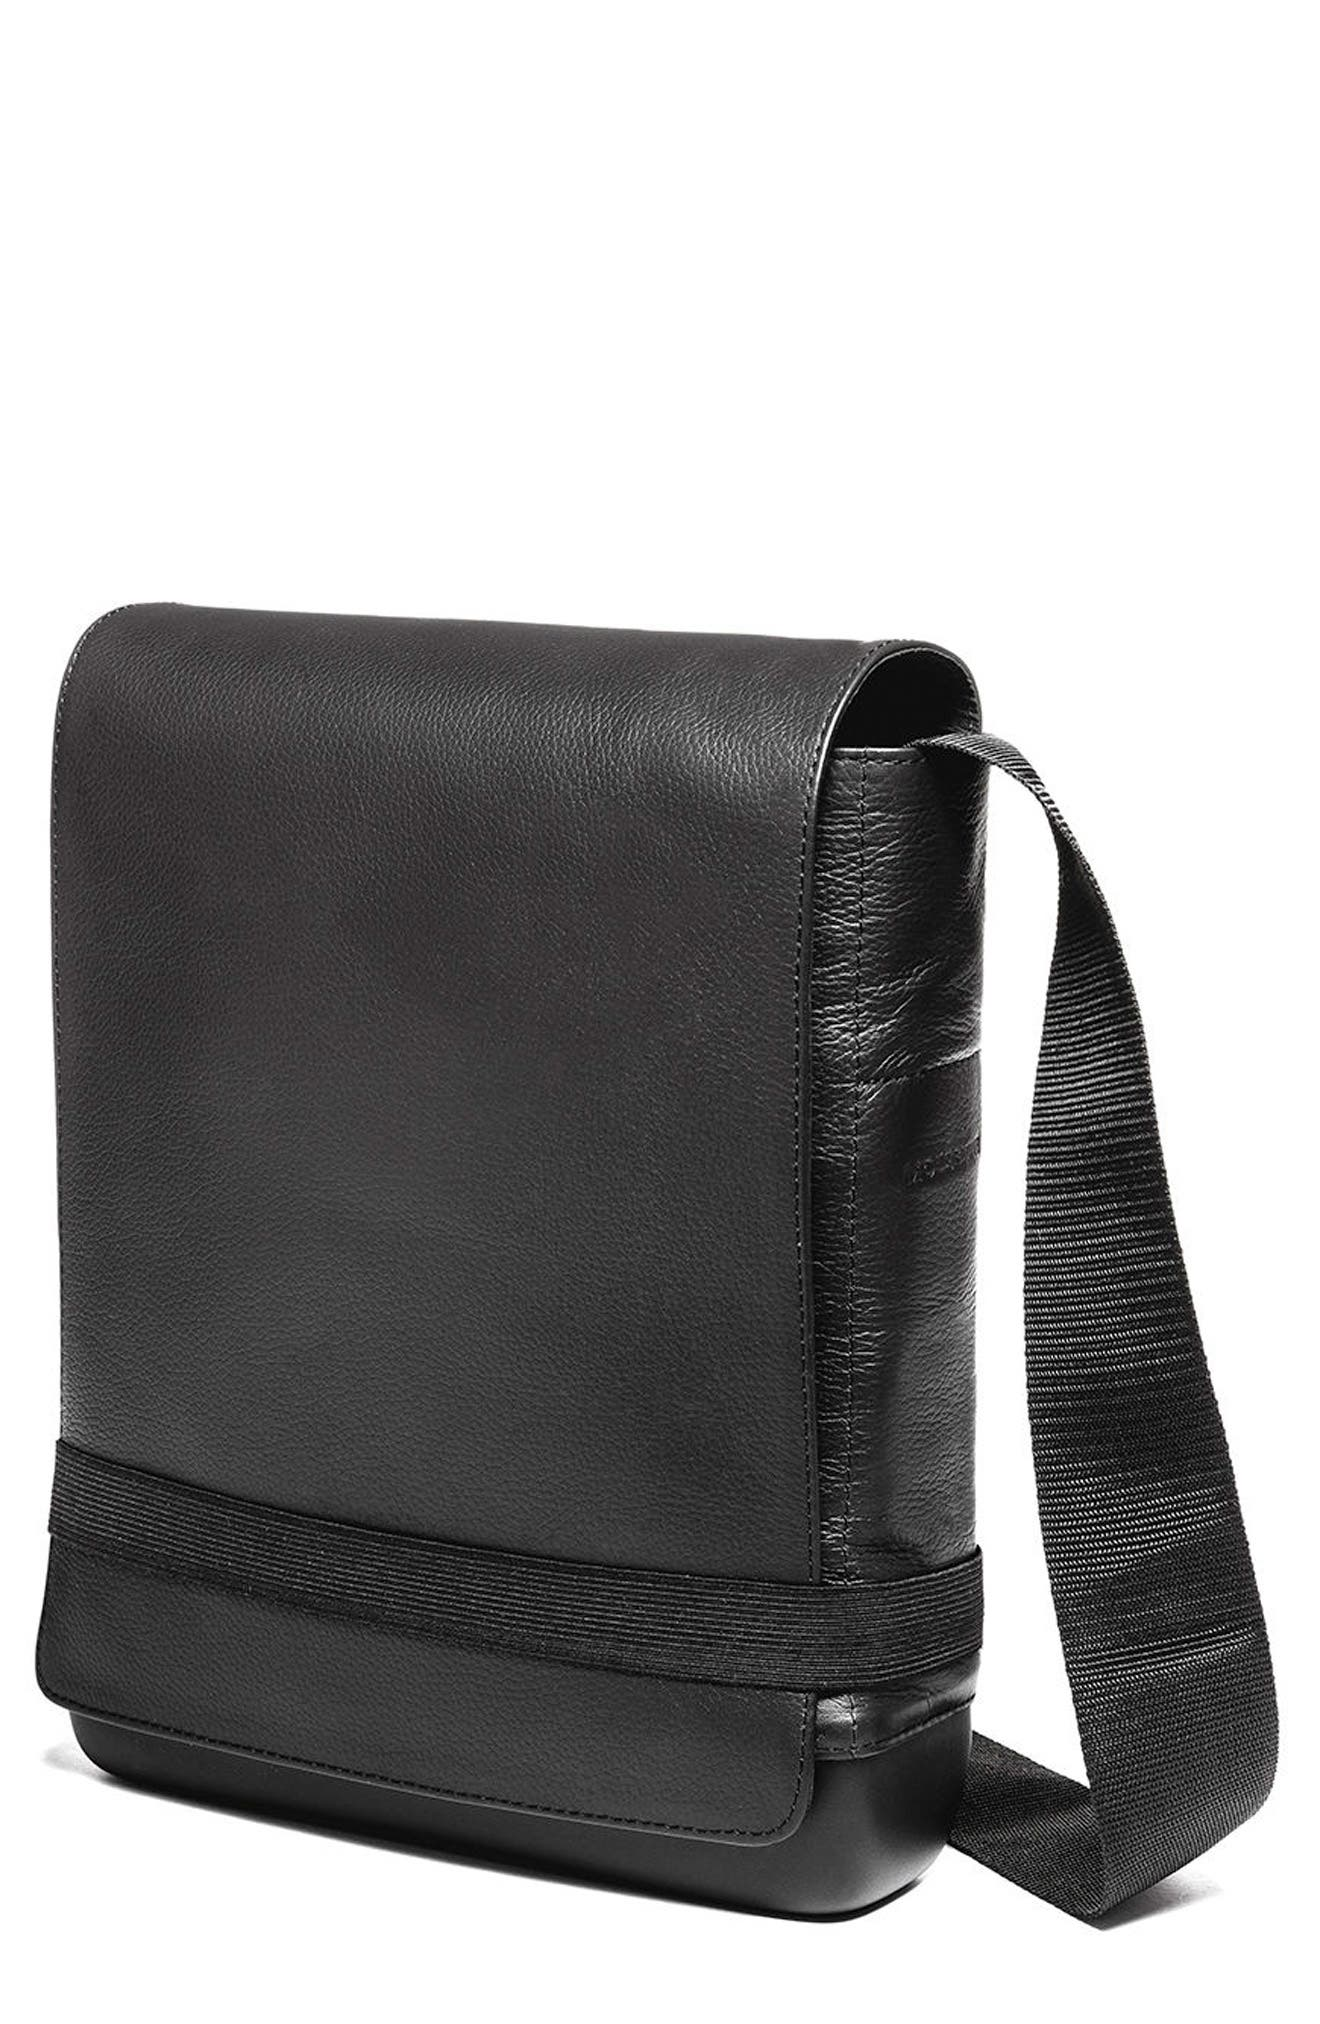 Alternate Image 1 Selected - Moleskine Leather Reporter Bag